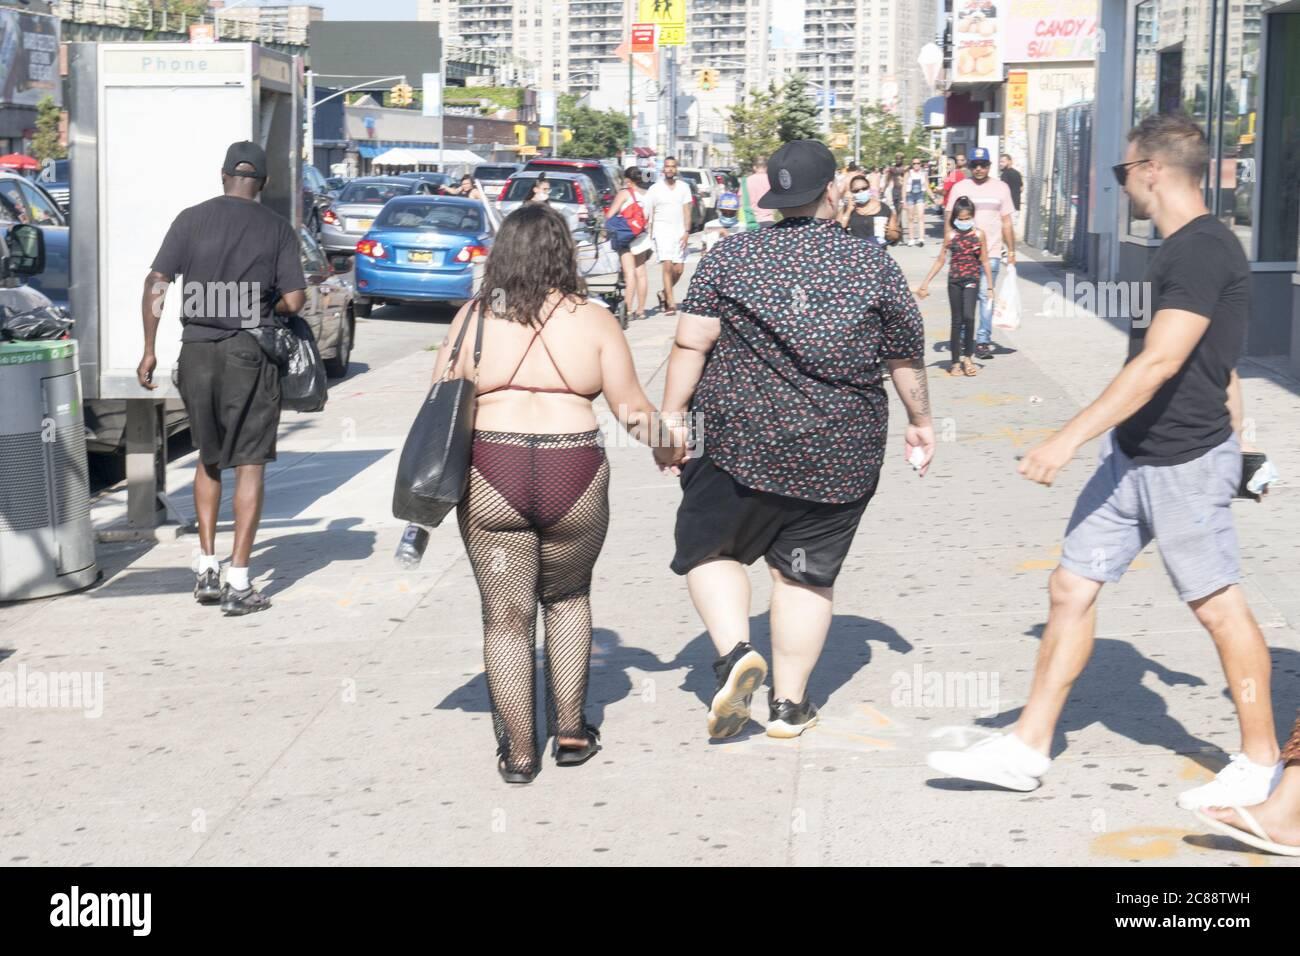 Nudist chubby Nuptial nudity: